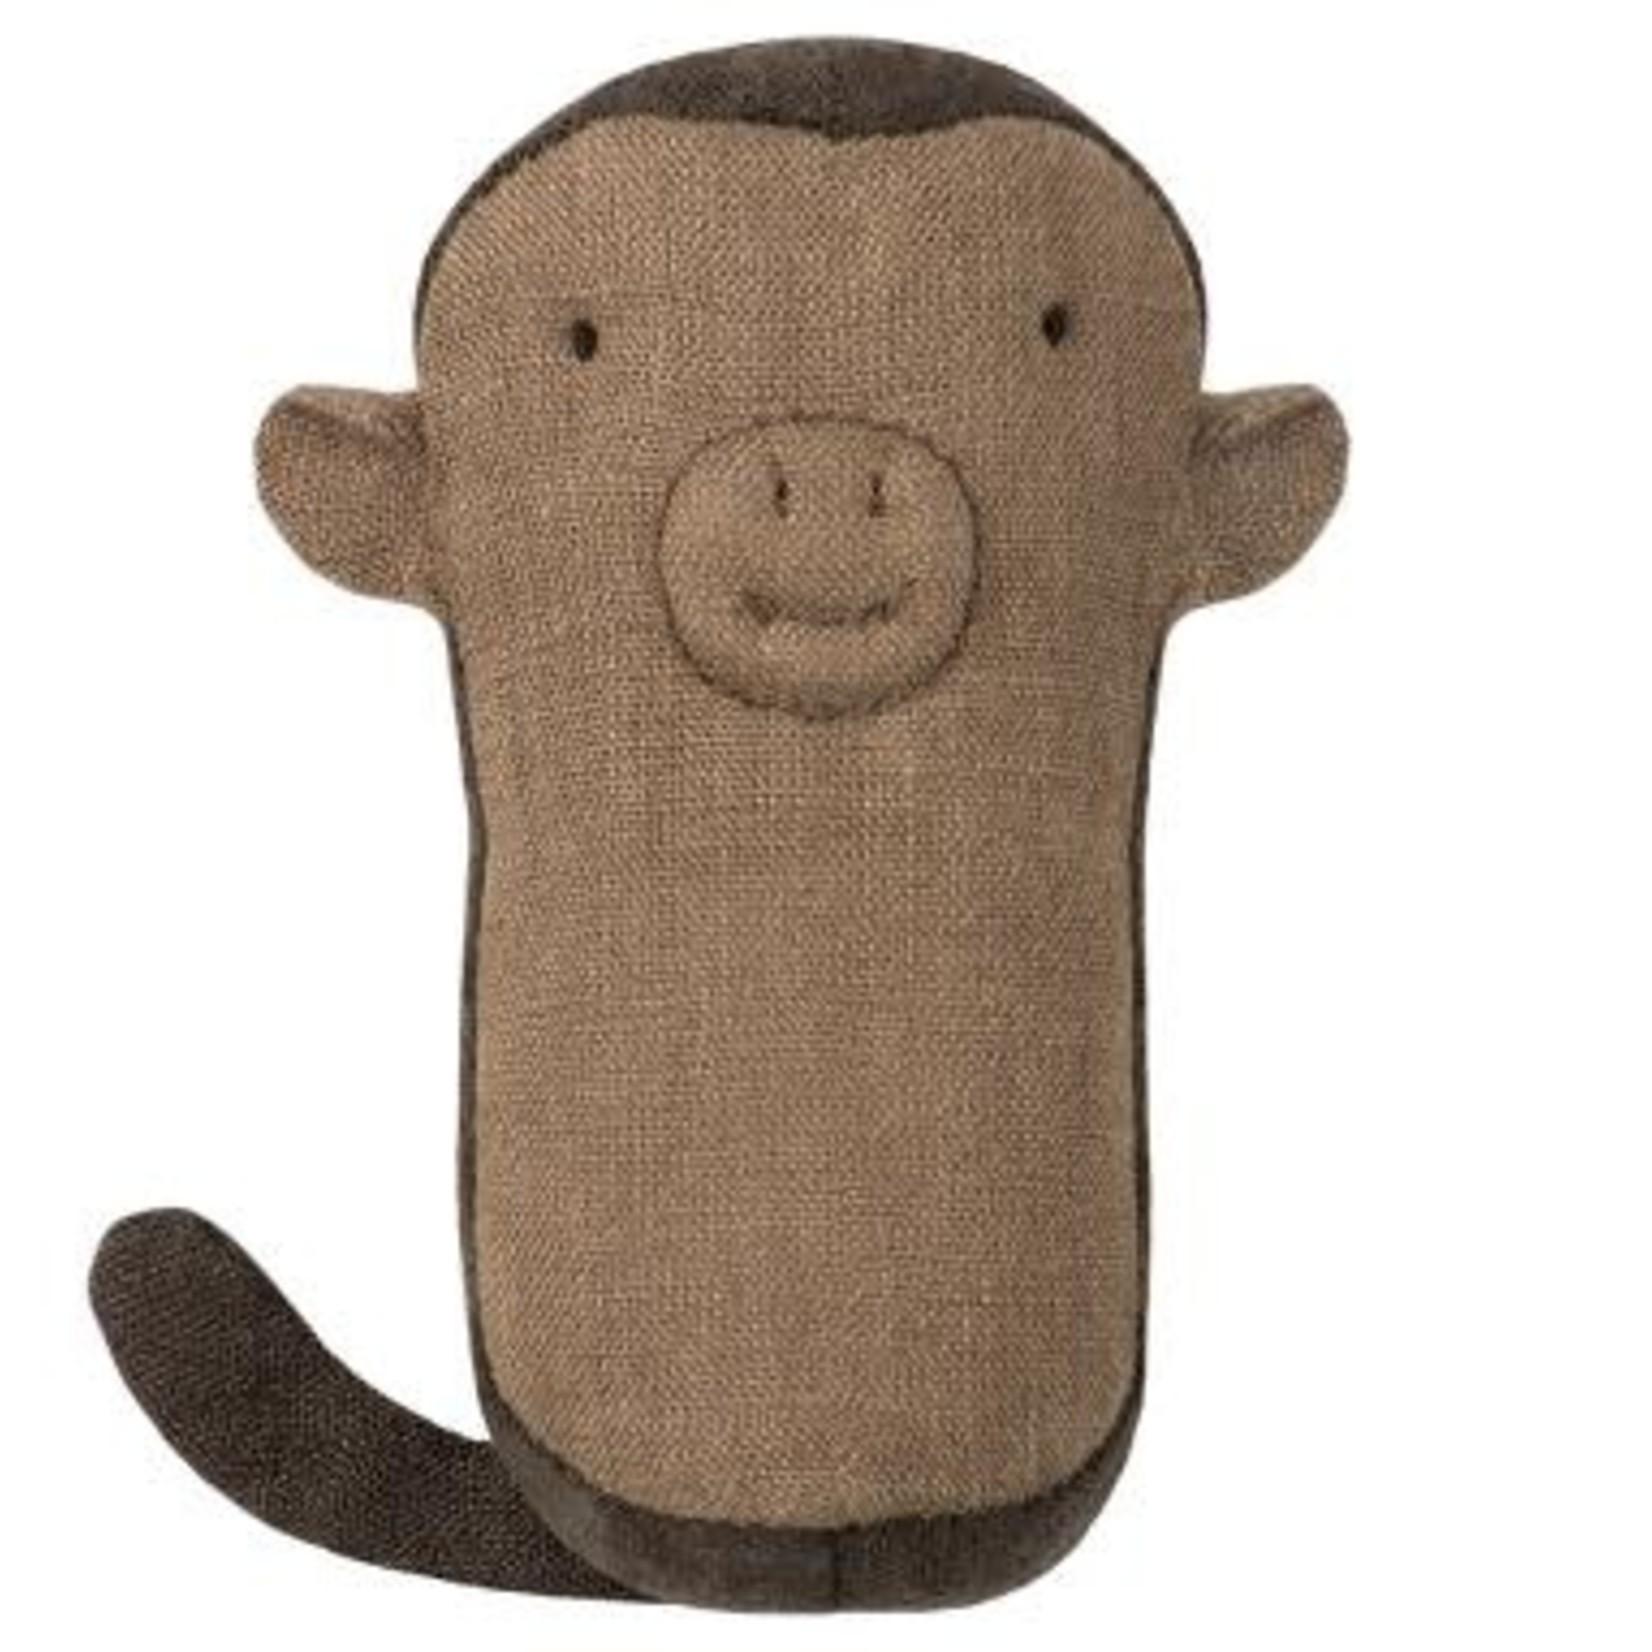 MAILEG Maileg Noahs Monkey Rattle